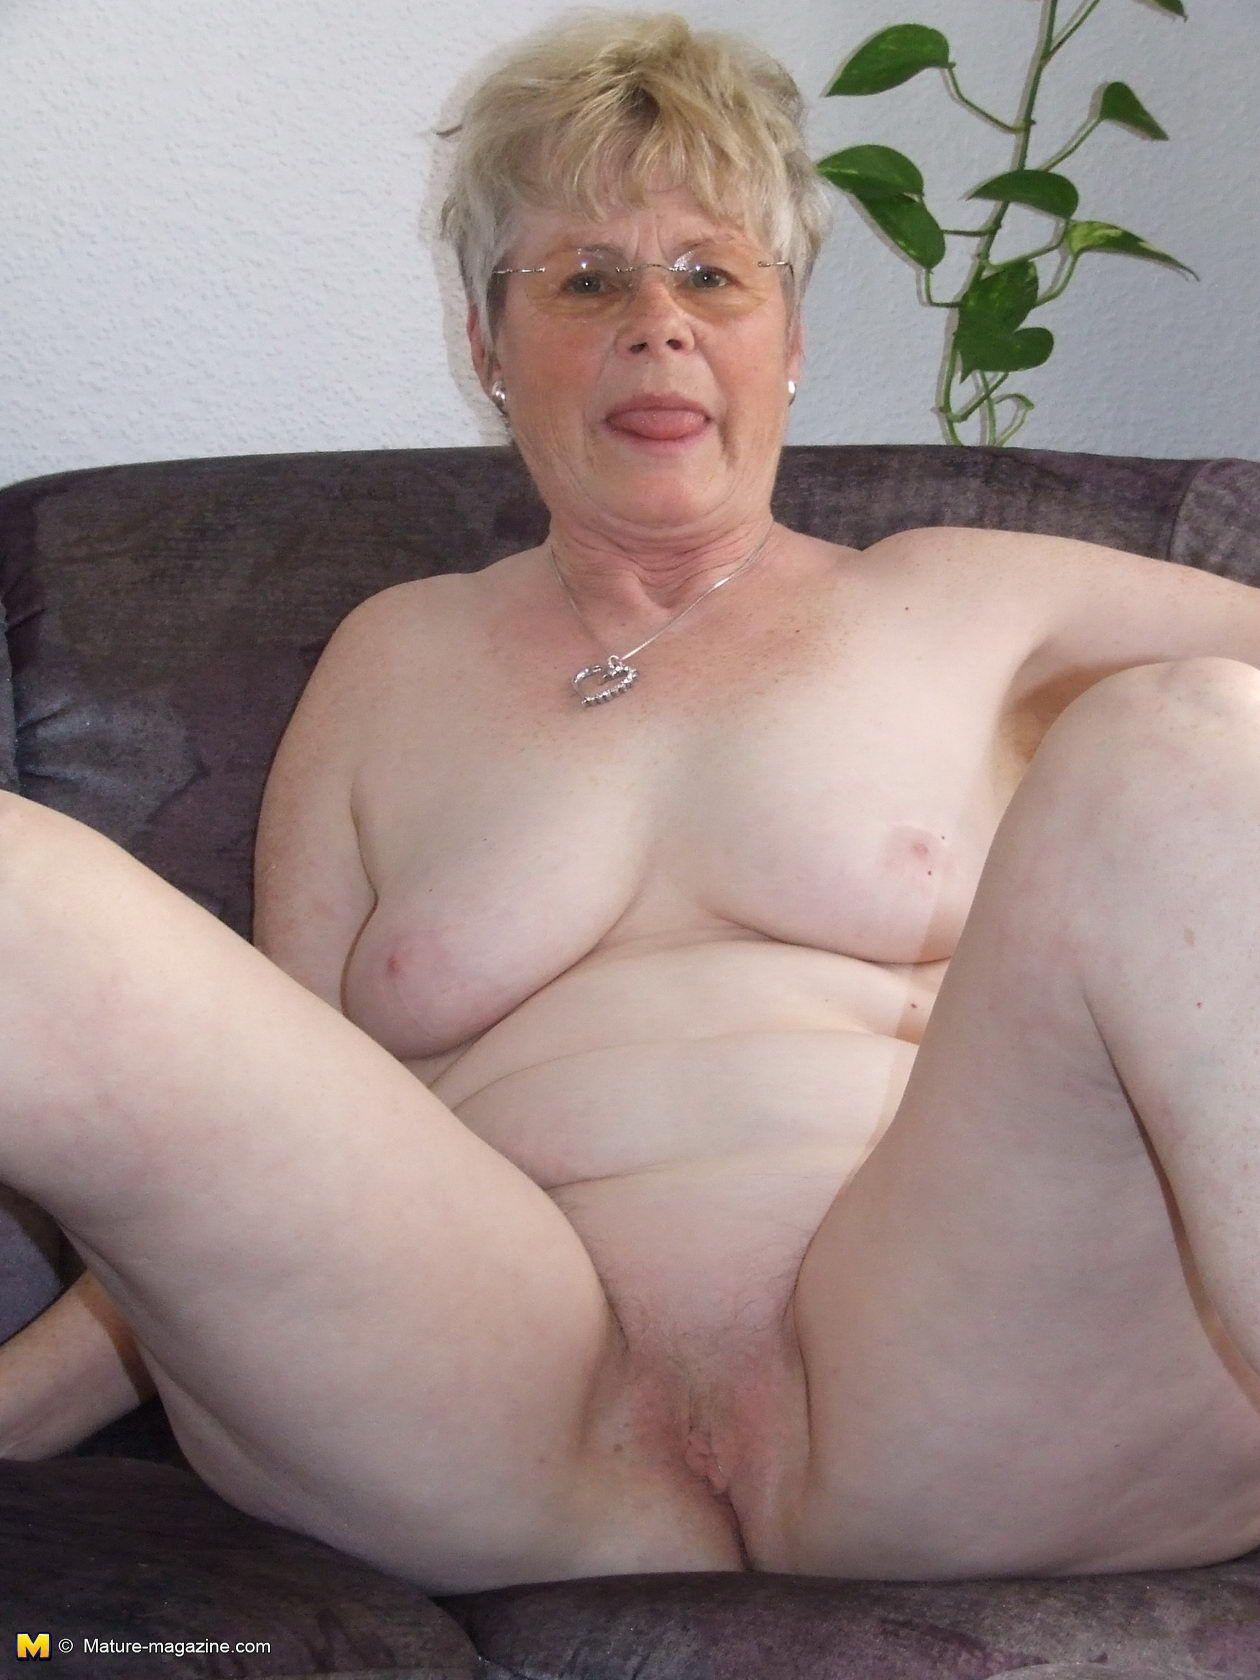 Old ladys nude pics